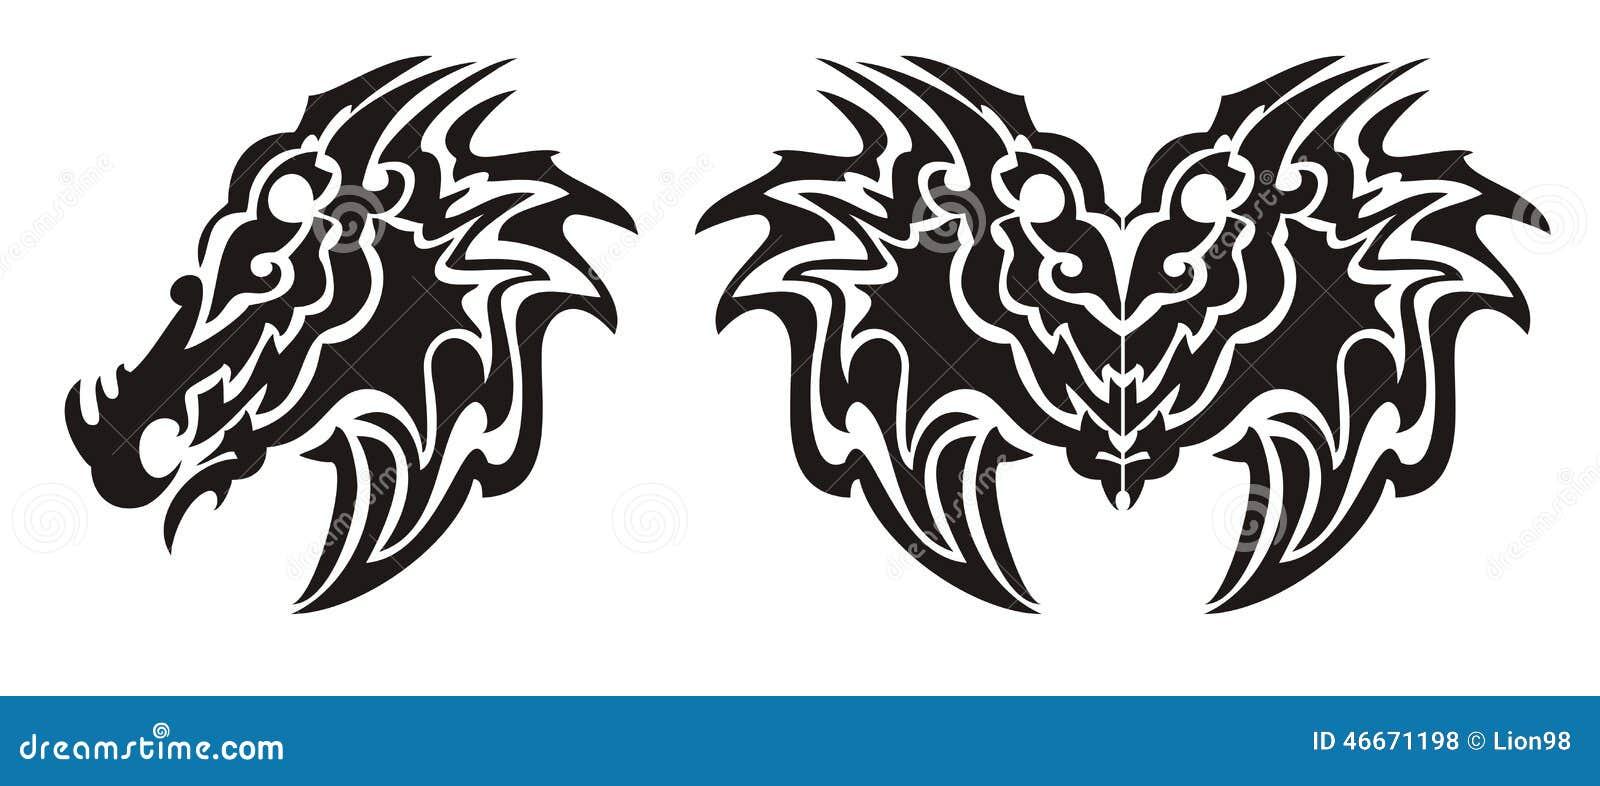 Tribal Dragon Head Symbol And Dragon Butterfly Tattoo ...